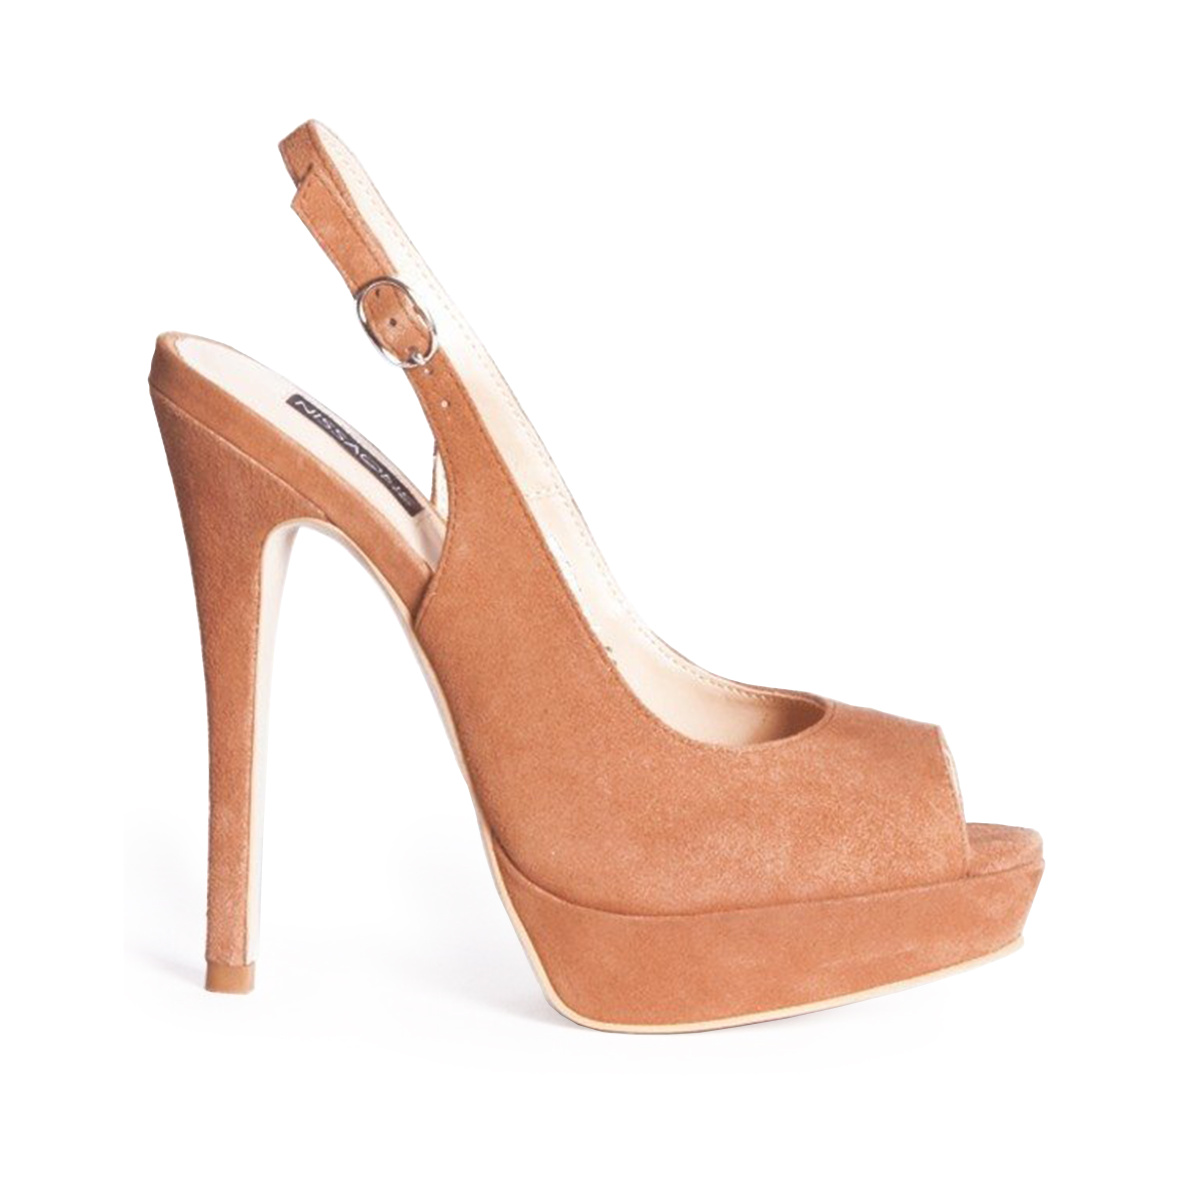 Sandale de seara cu varf decupat si toc inalt Camel